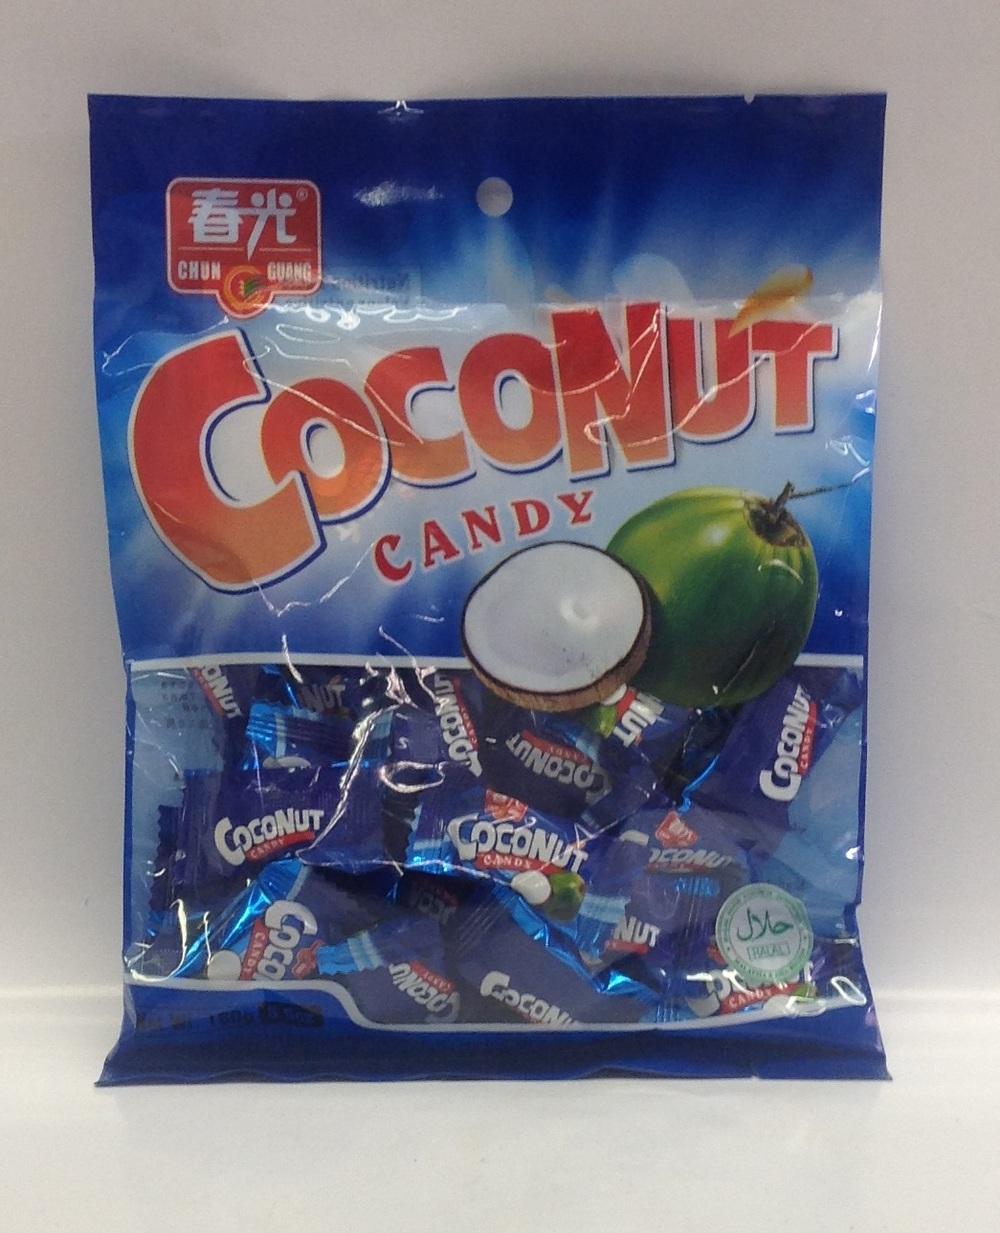 Coconut Candy   Chunguang   CN11200 40x5.6 oz